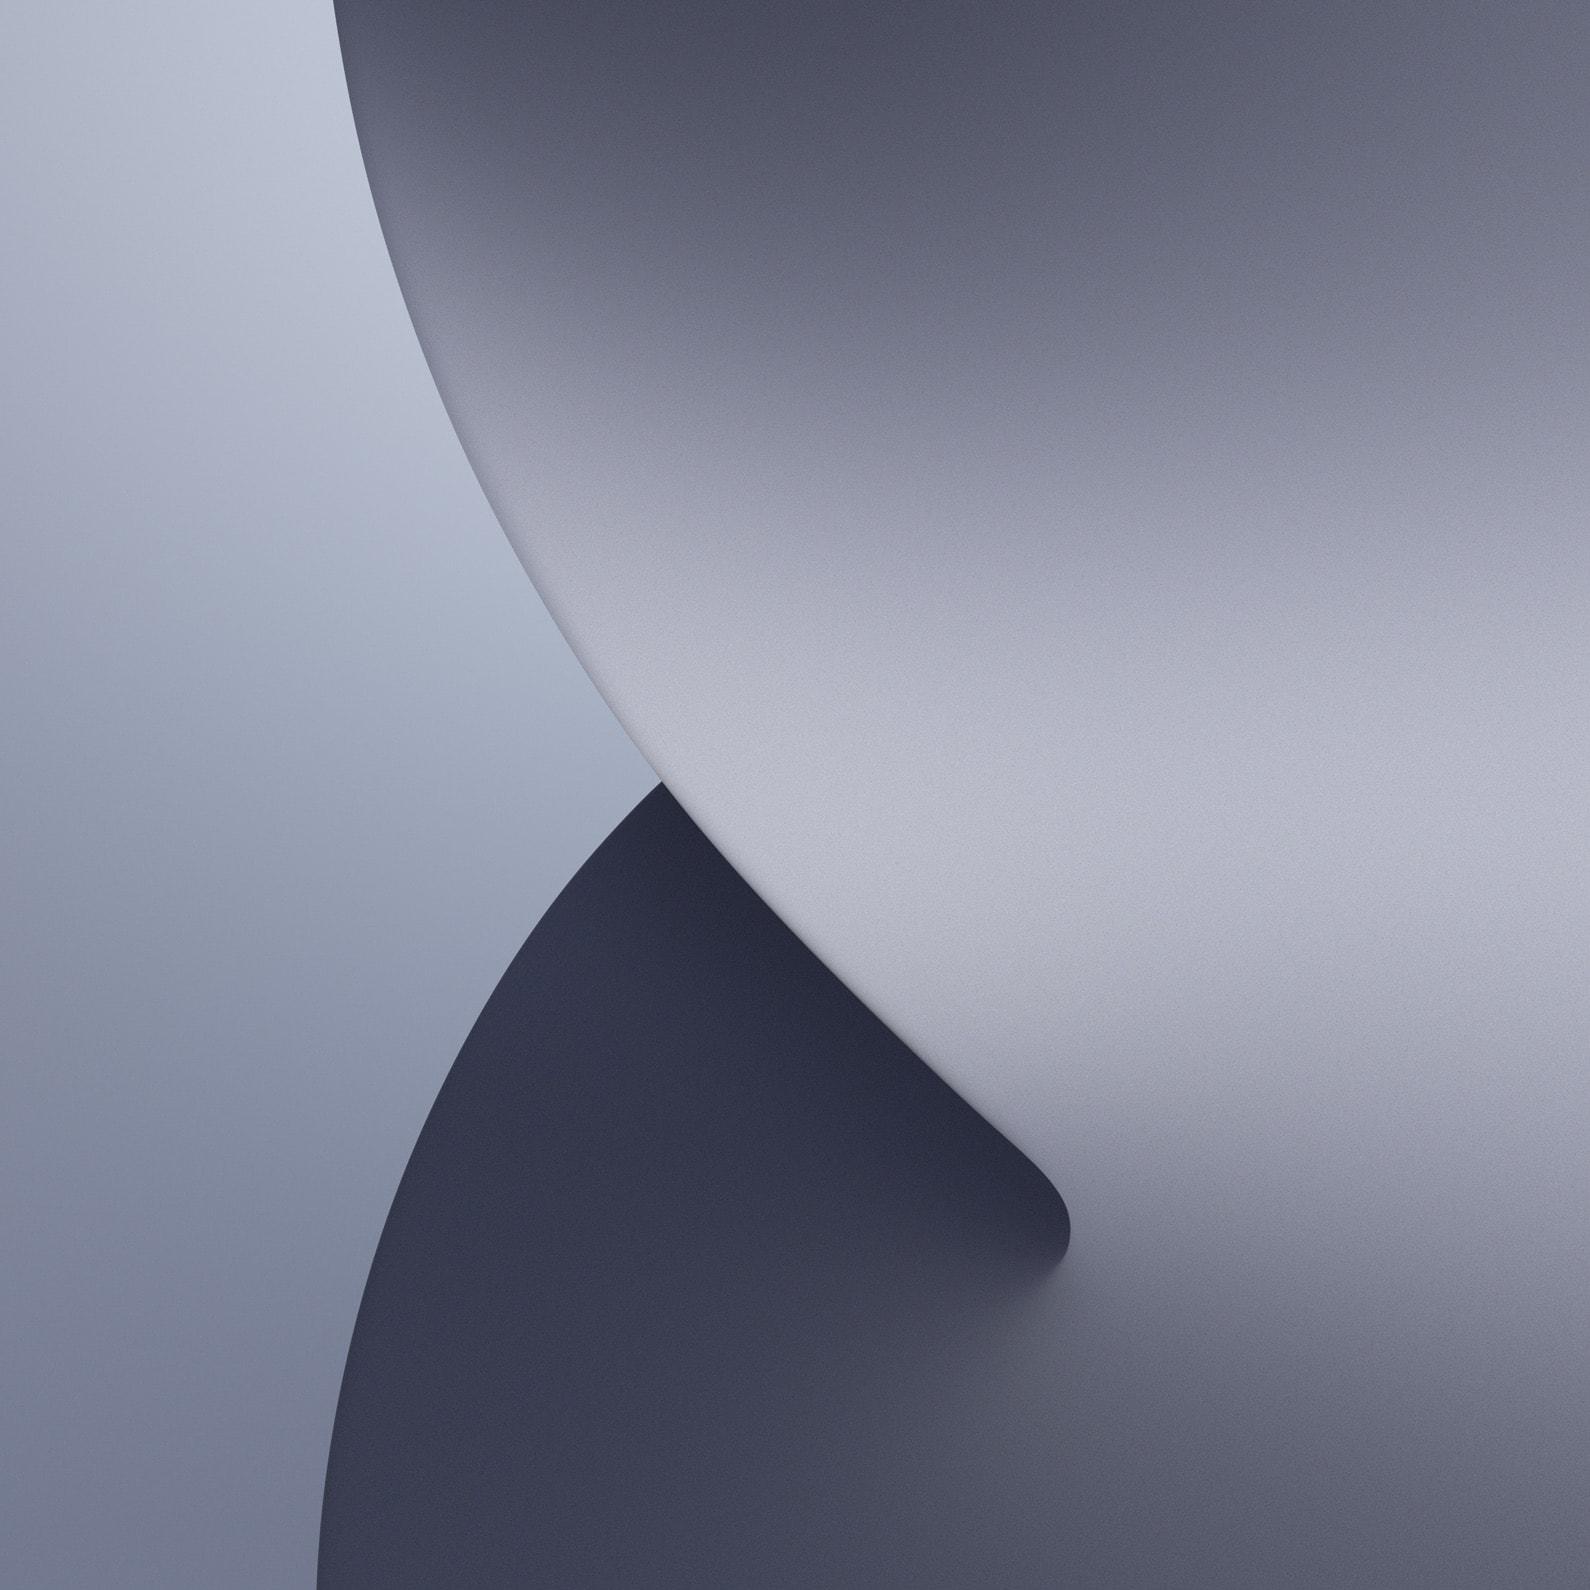 iOS 14 Wallpaper